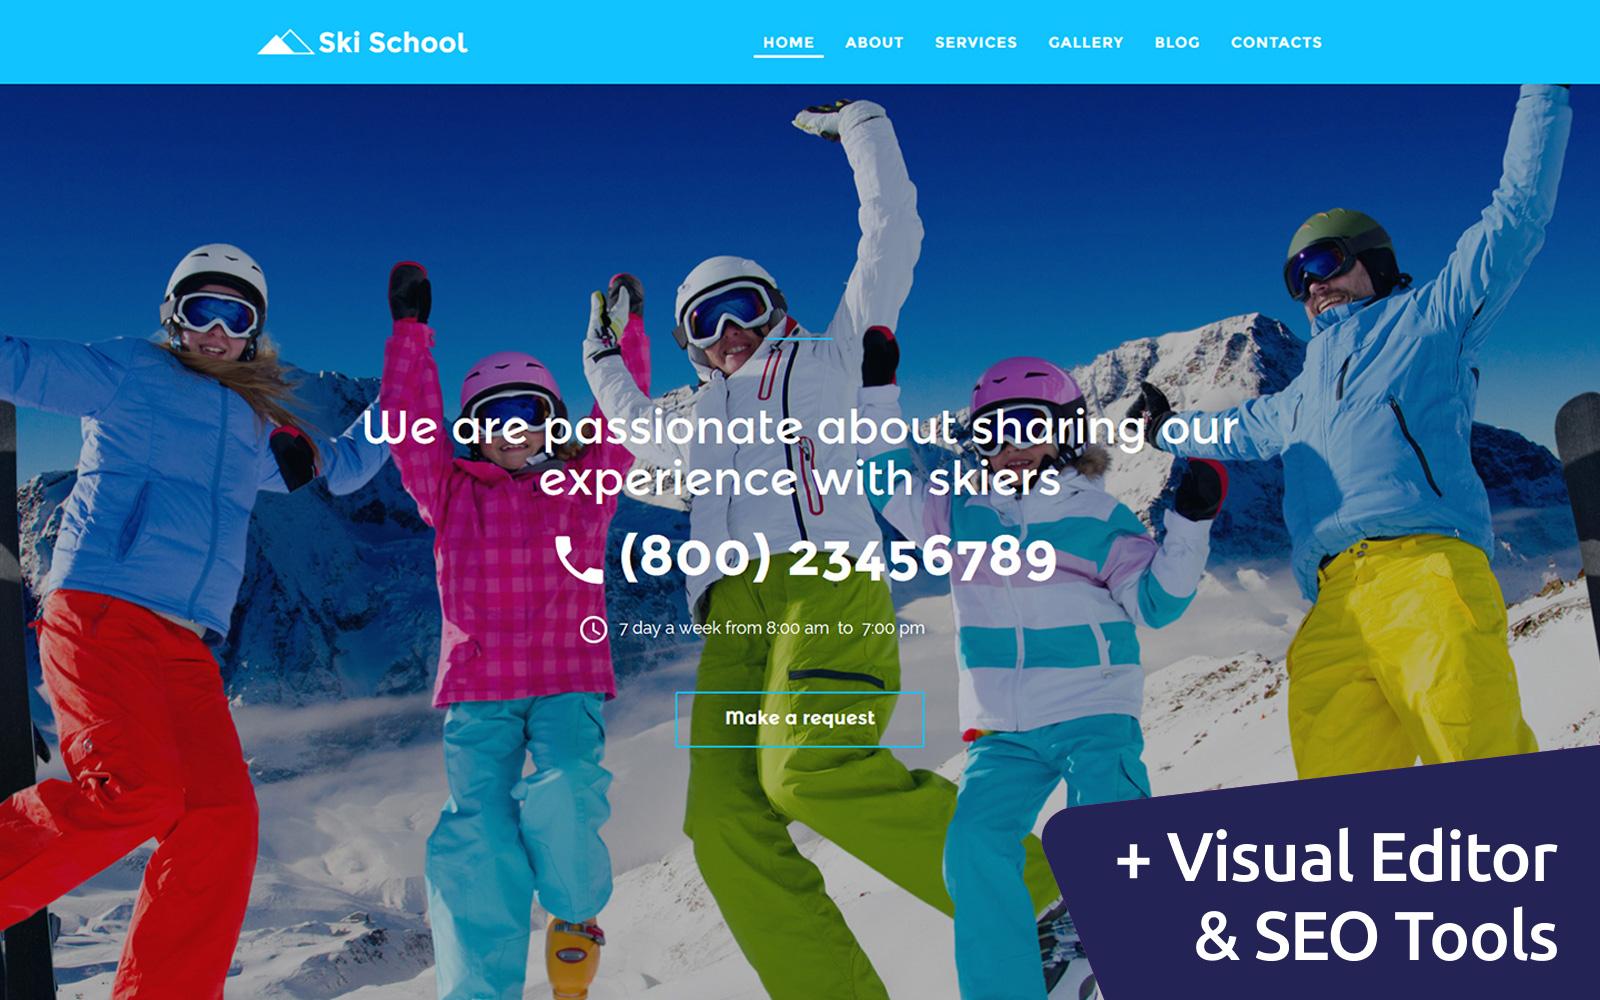 Snowboarding & Ski School Moto CMS 3 Template